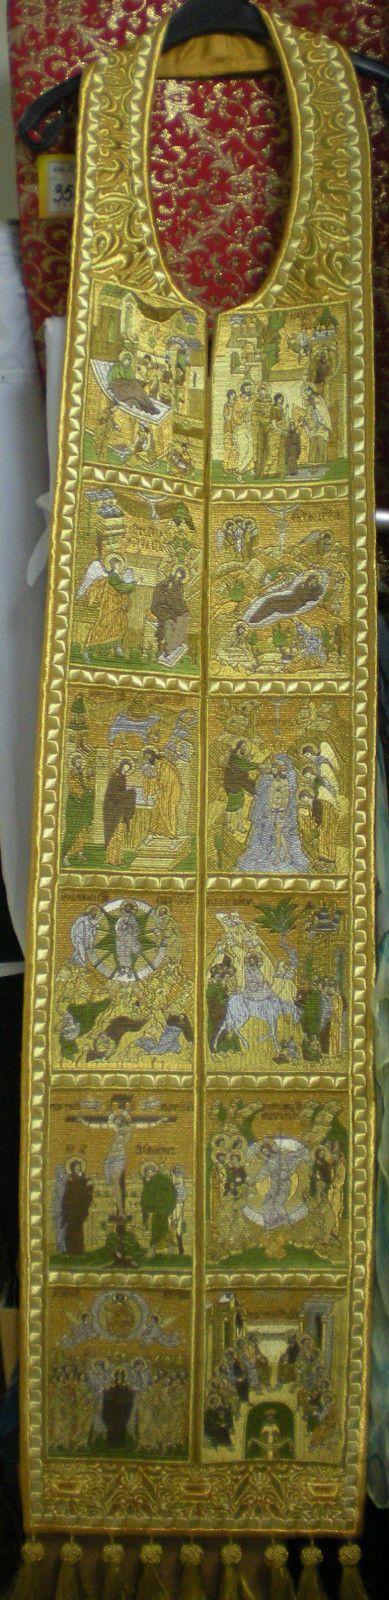 http://www.ebay.com/itm/Russian-Orthodox-Communion-Priest-Set-Embroidered-Stole-Cuffs-Gold-Vestment-/200719501044?pt=LH_DefaultDomain_0